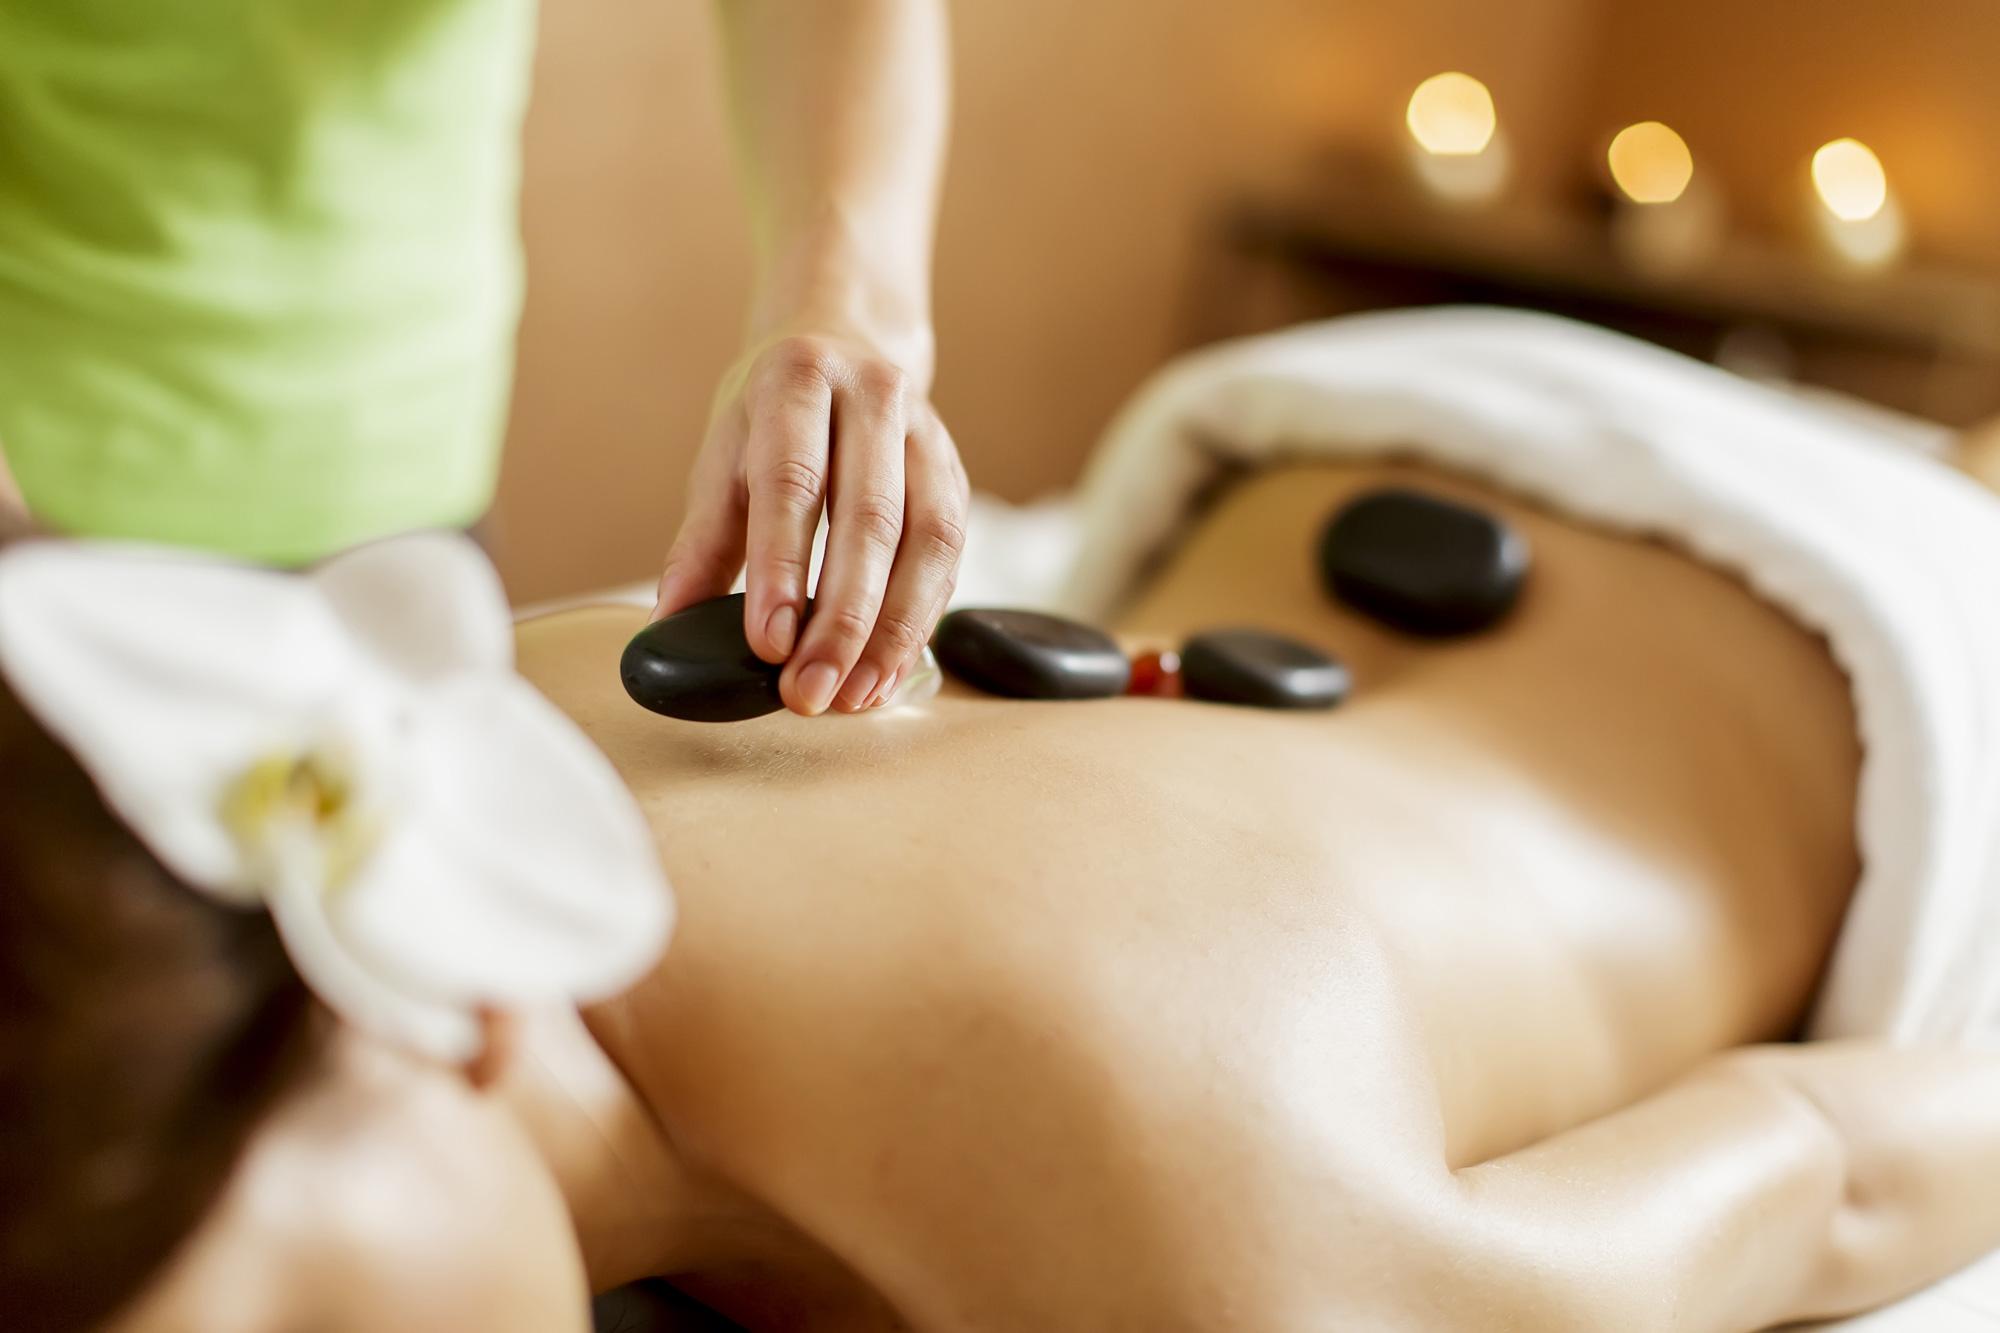 korawan-thaimassage-konstanz-frau-thai-hot-stone-massage-2000x1333